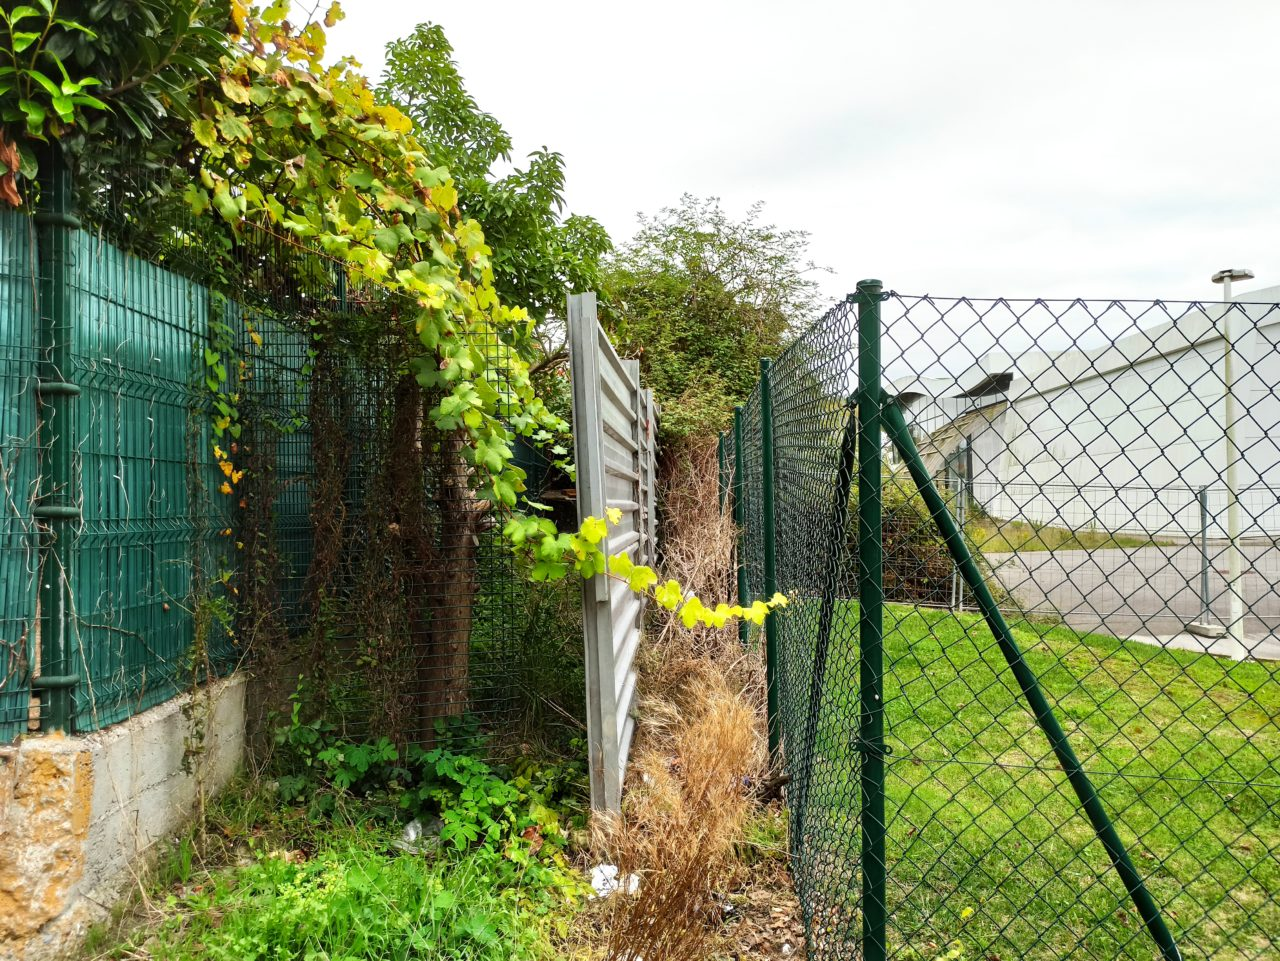 Valla separadora entre urbanización y depuradora (miGijón)